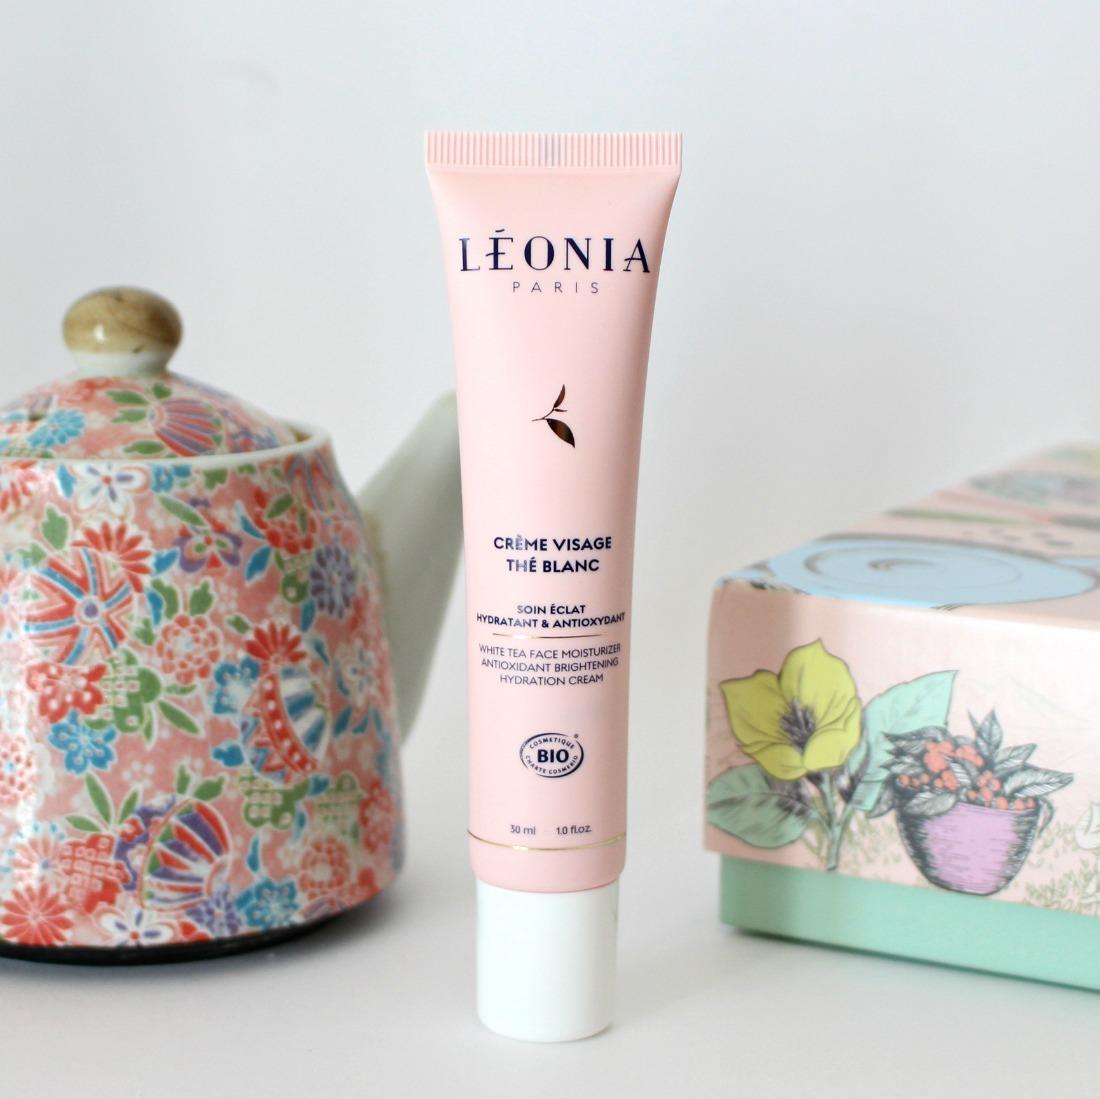 crème visage bio léonia